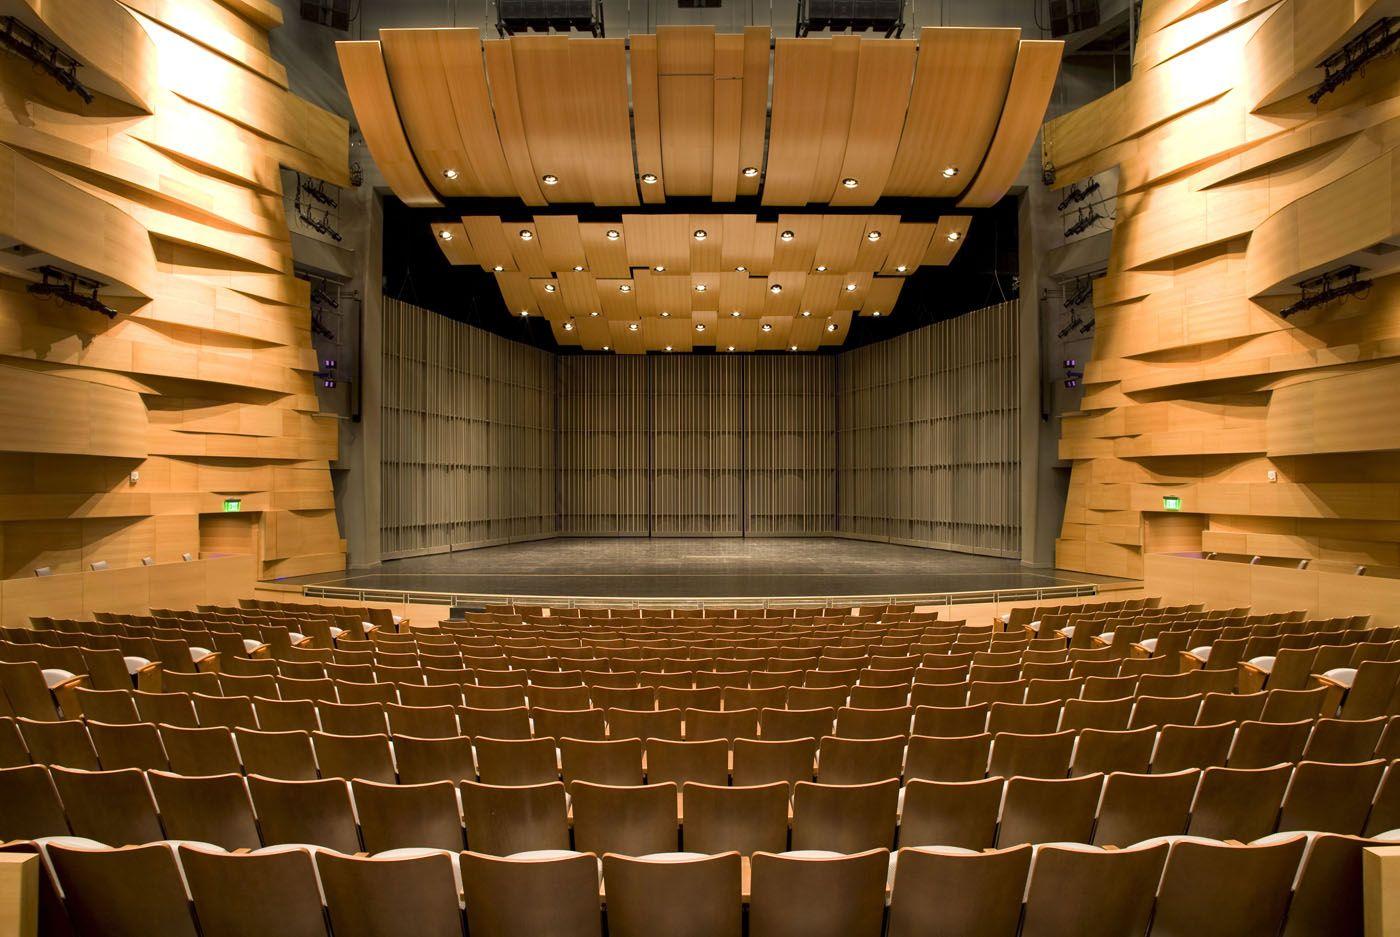 Valley Performing Arts Center Performing Arts Center Performance Art Art Center